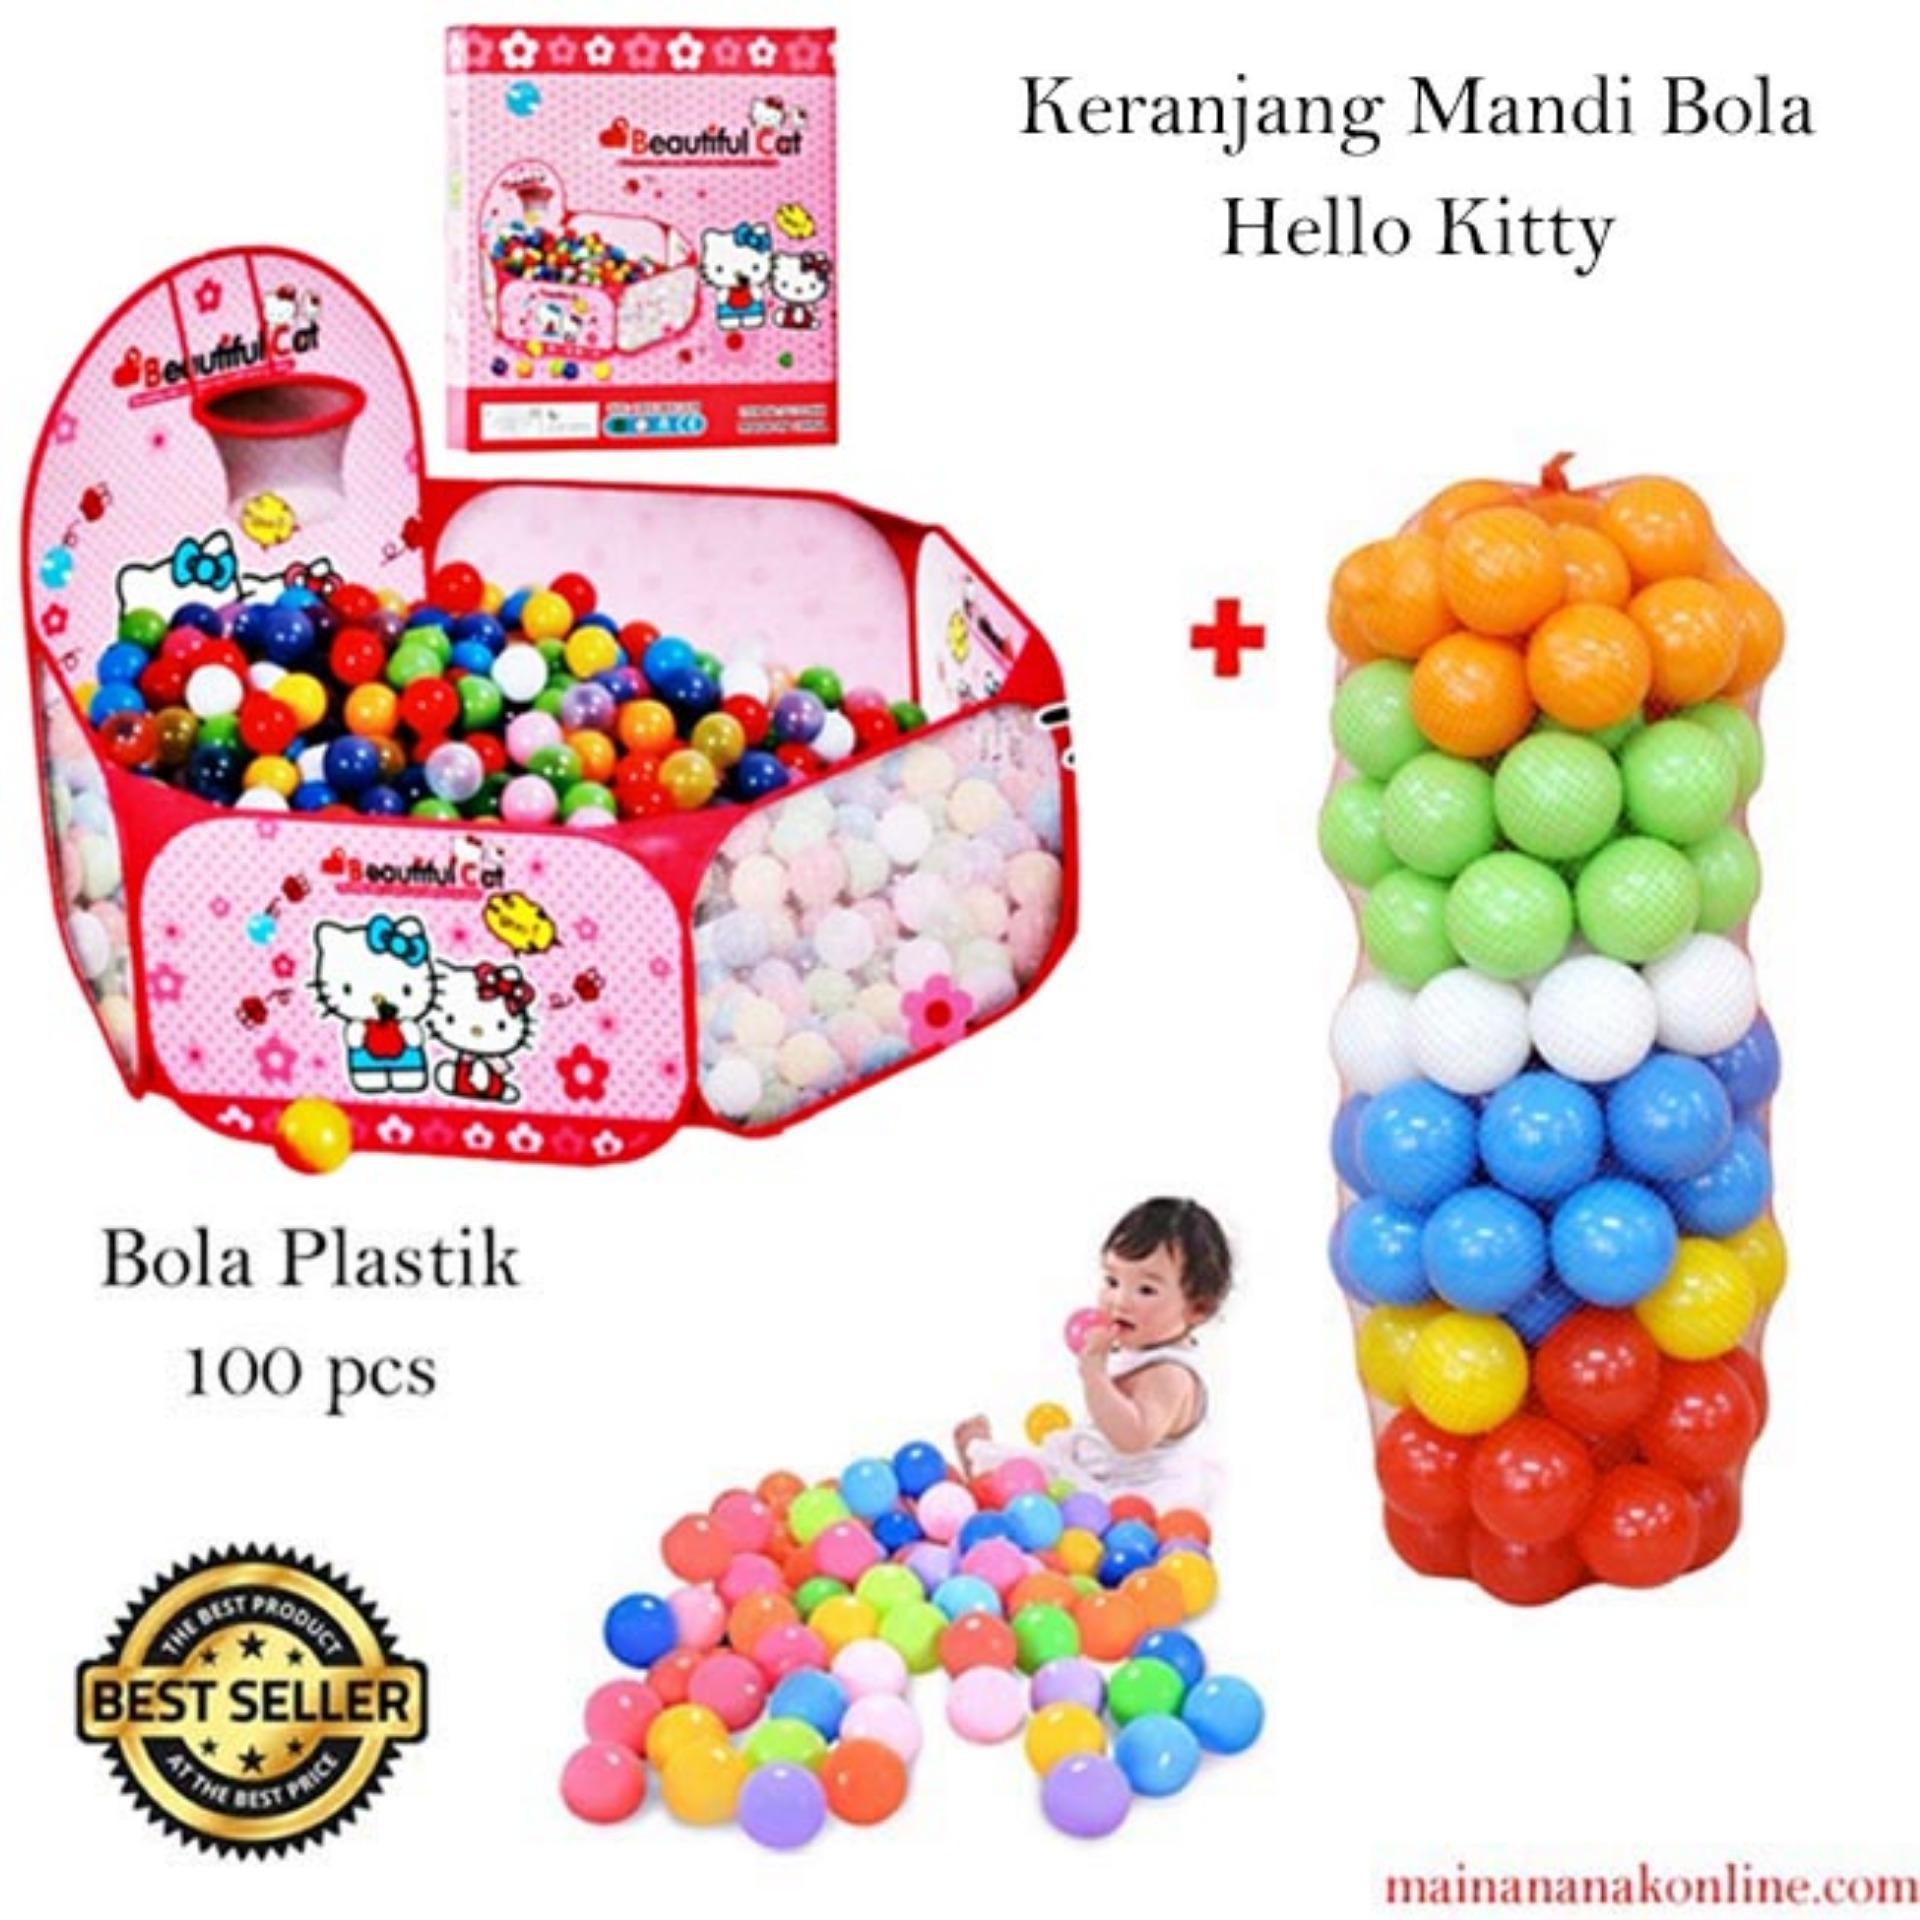 MAO Tenda Mandi Bola Hello Kity + Bola Plastik 100pcs - Ball Pit